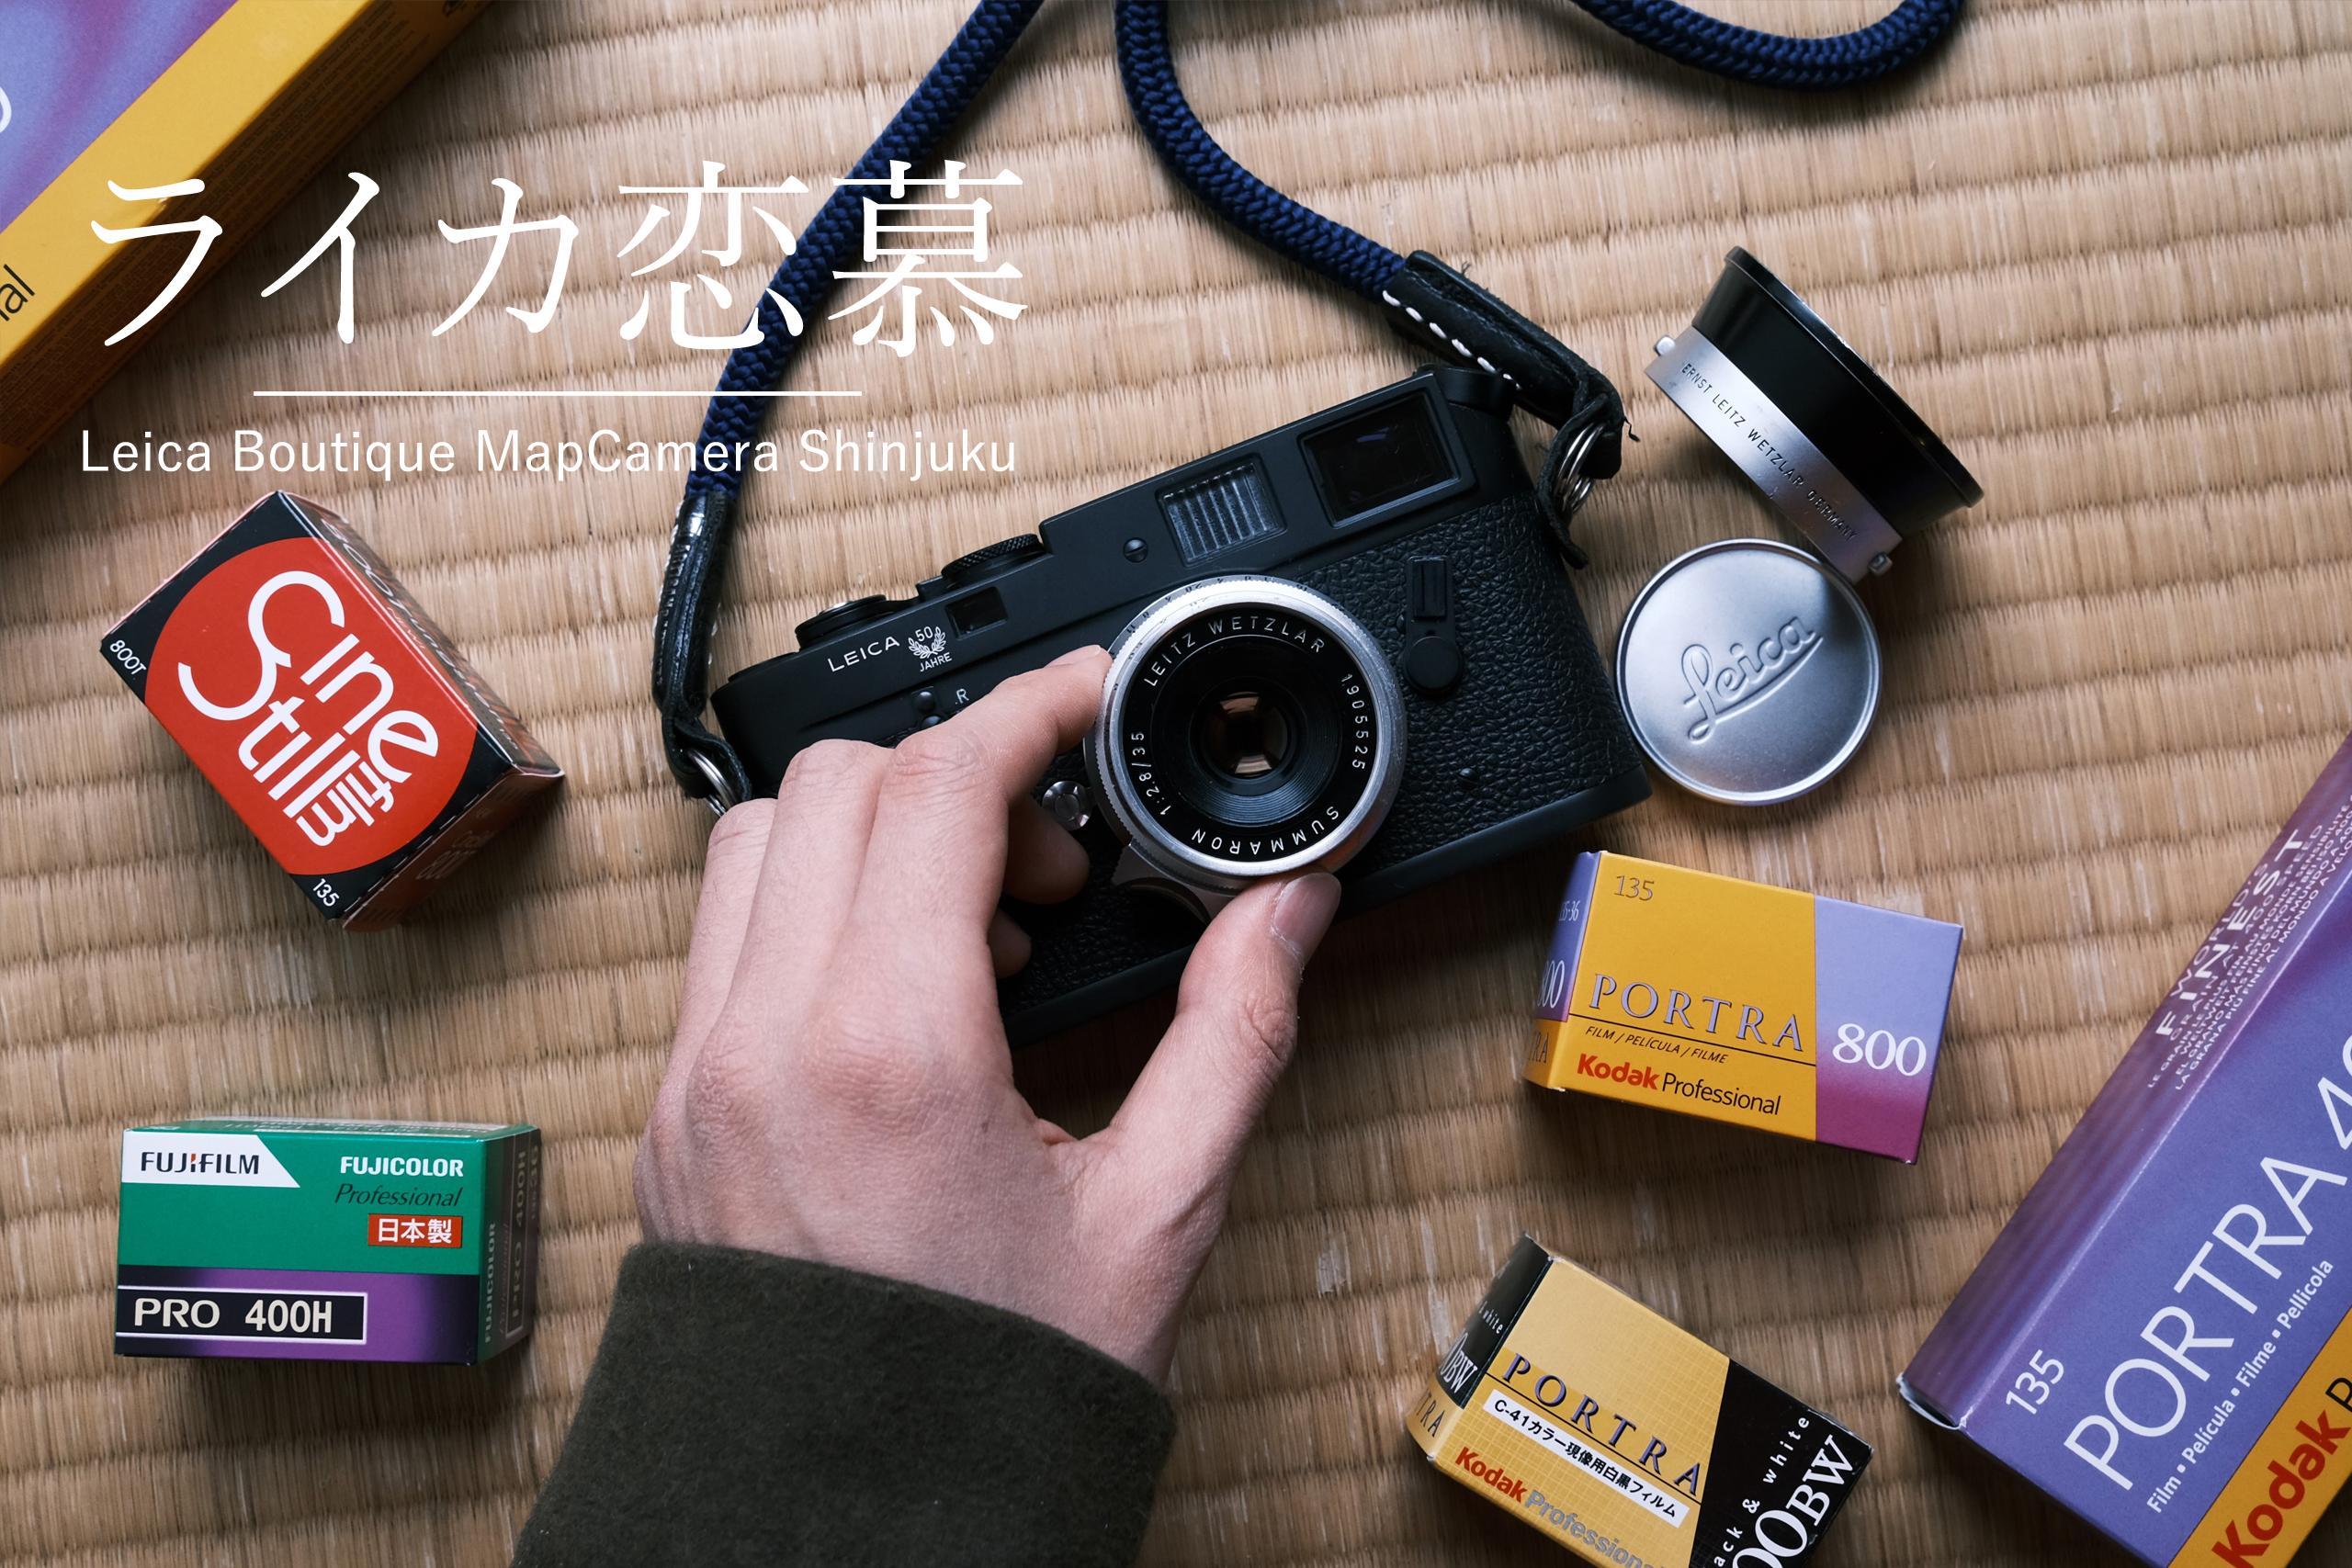 【Leica Boutique MapCamera Shinjuku 8th】私のM4 50JAHRE愛